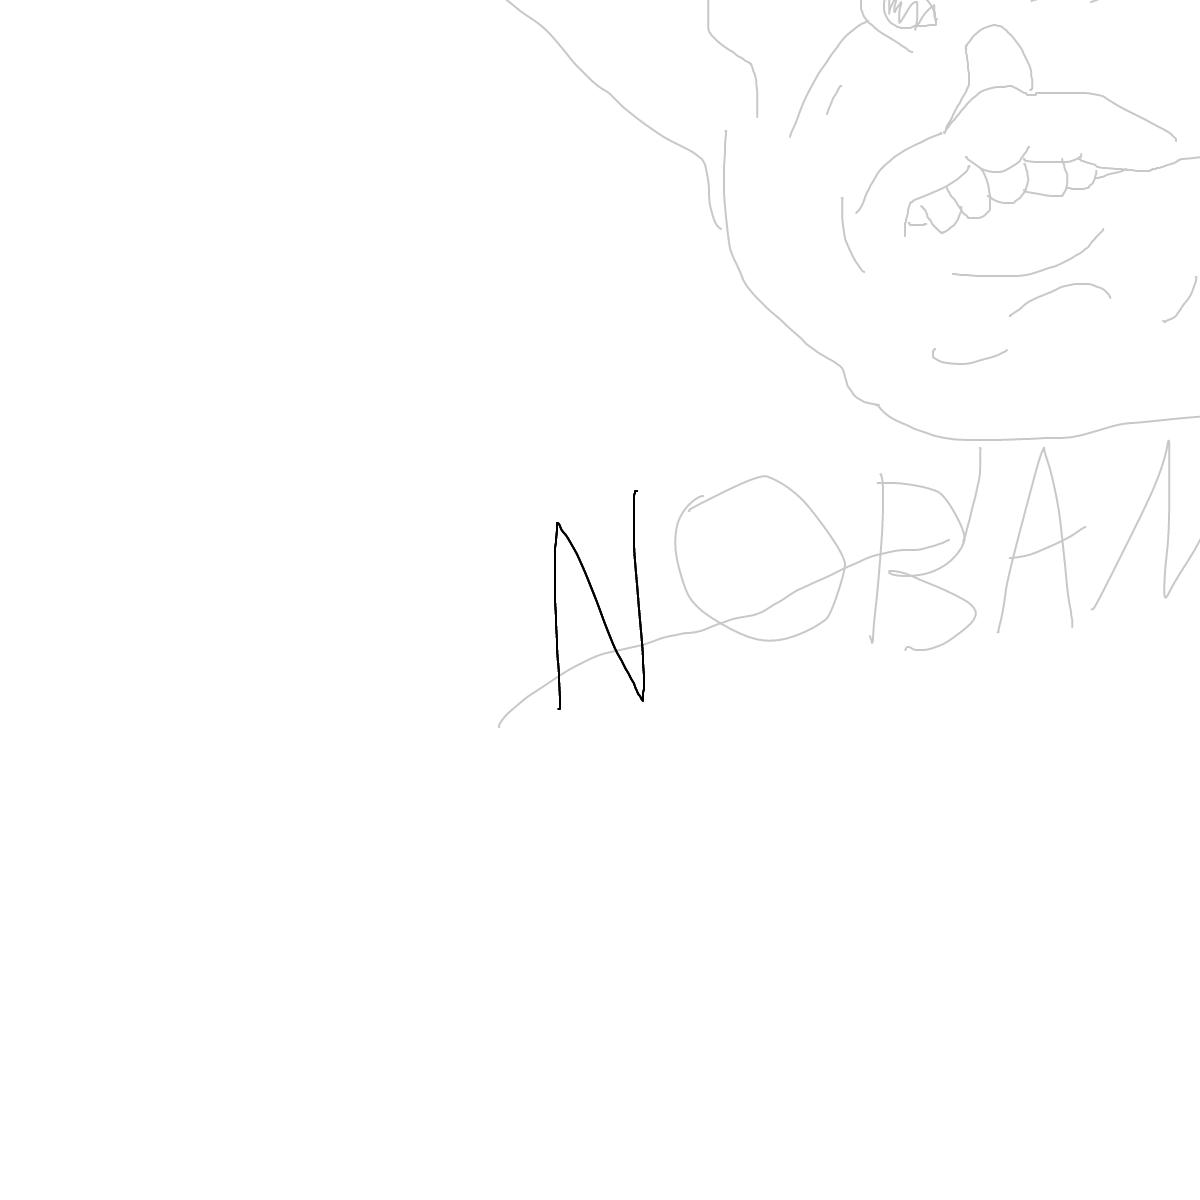 BAAAM drawing#9625 lat:52.4749145507812500lng: 13.4068202972412110